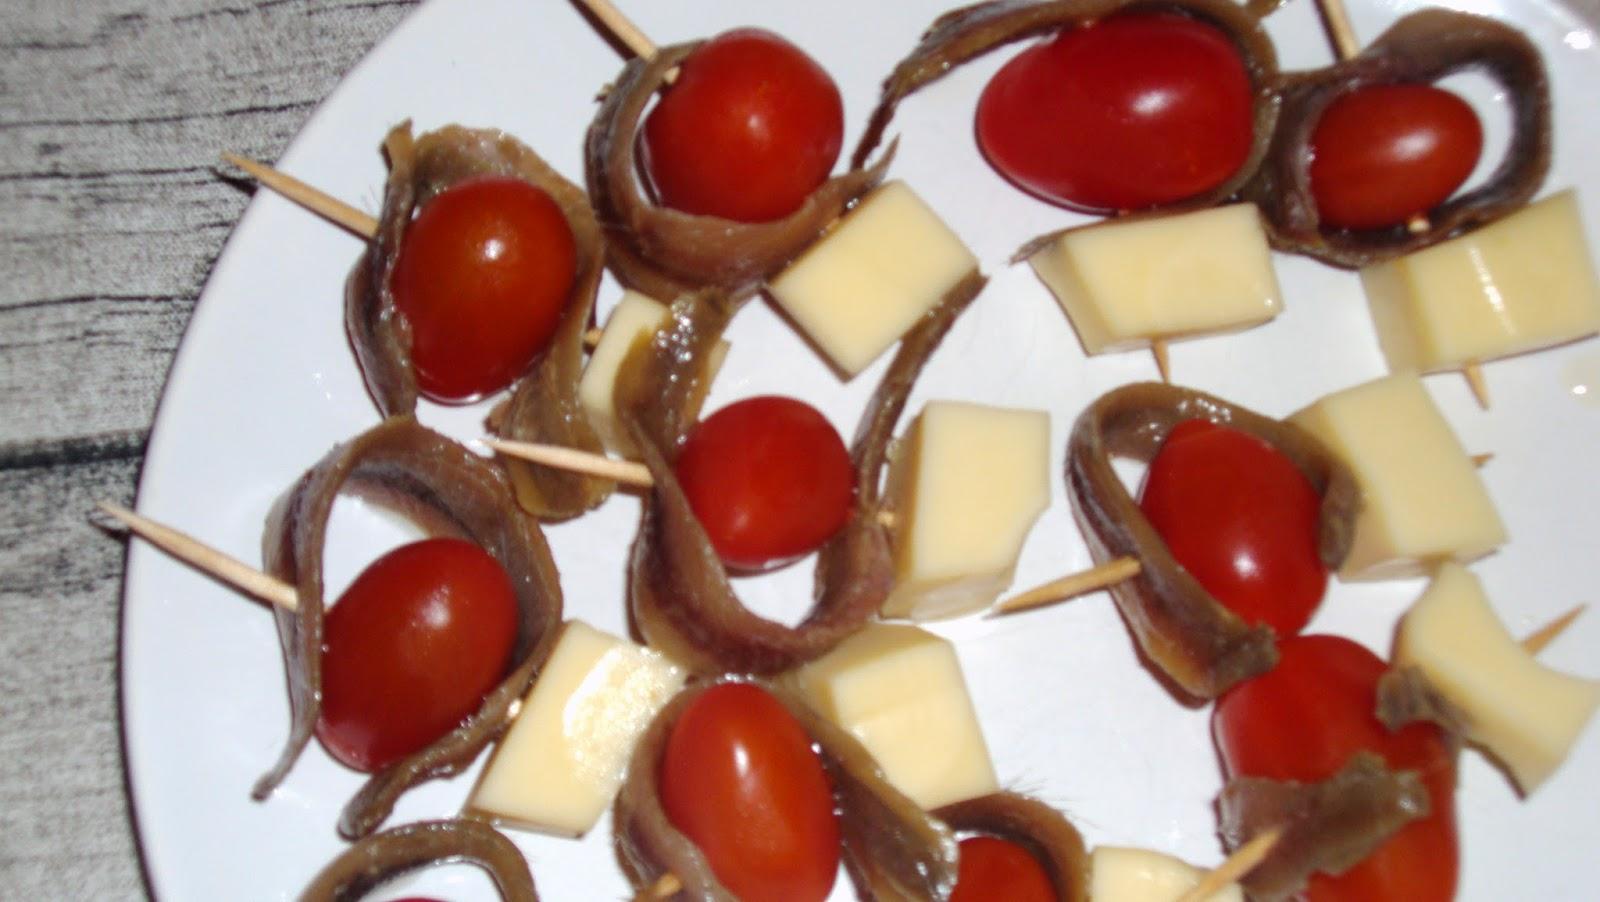 Pinchos de tomate cherry con queso fresco